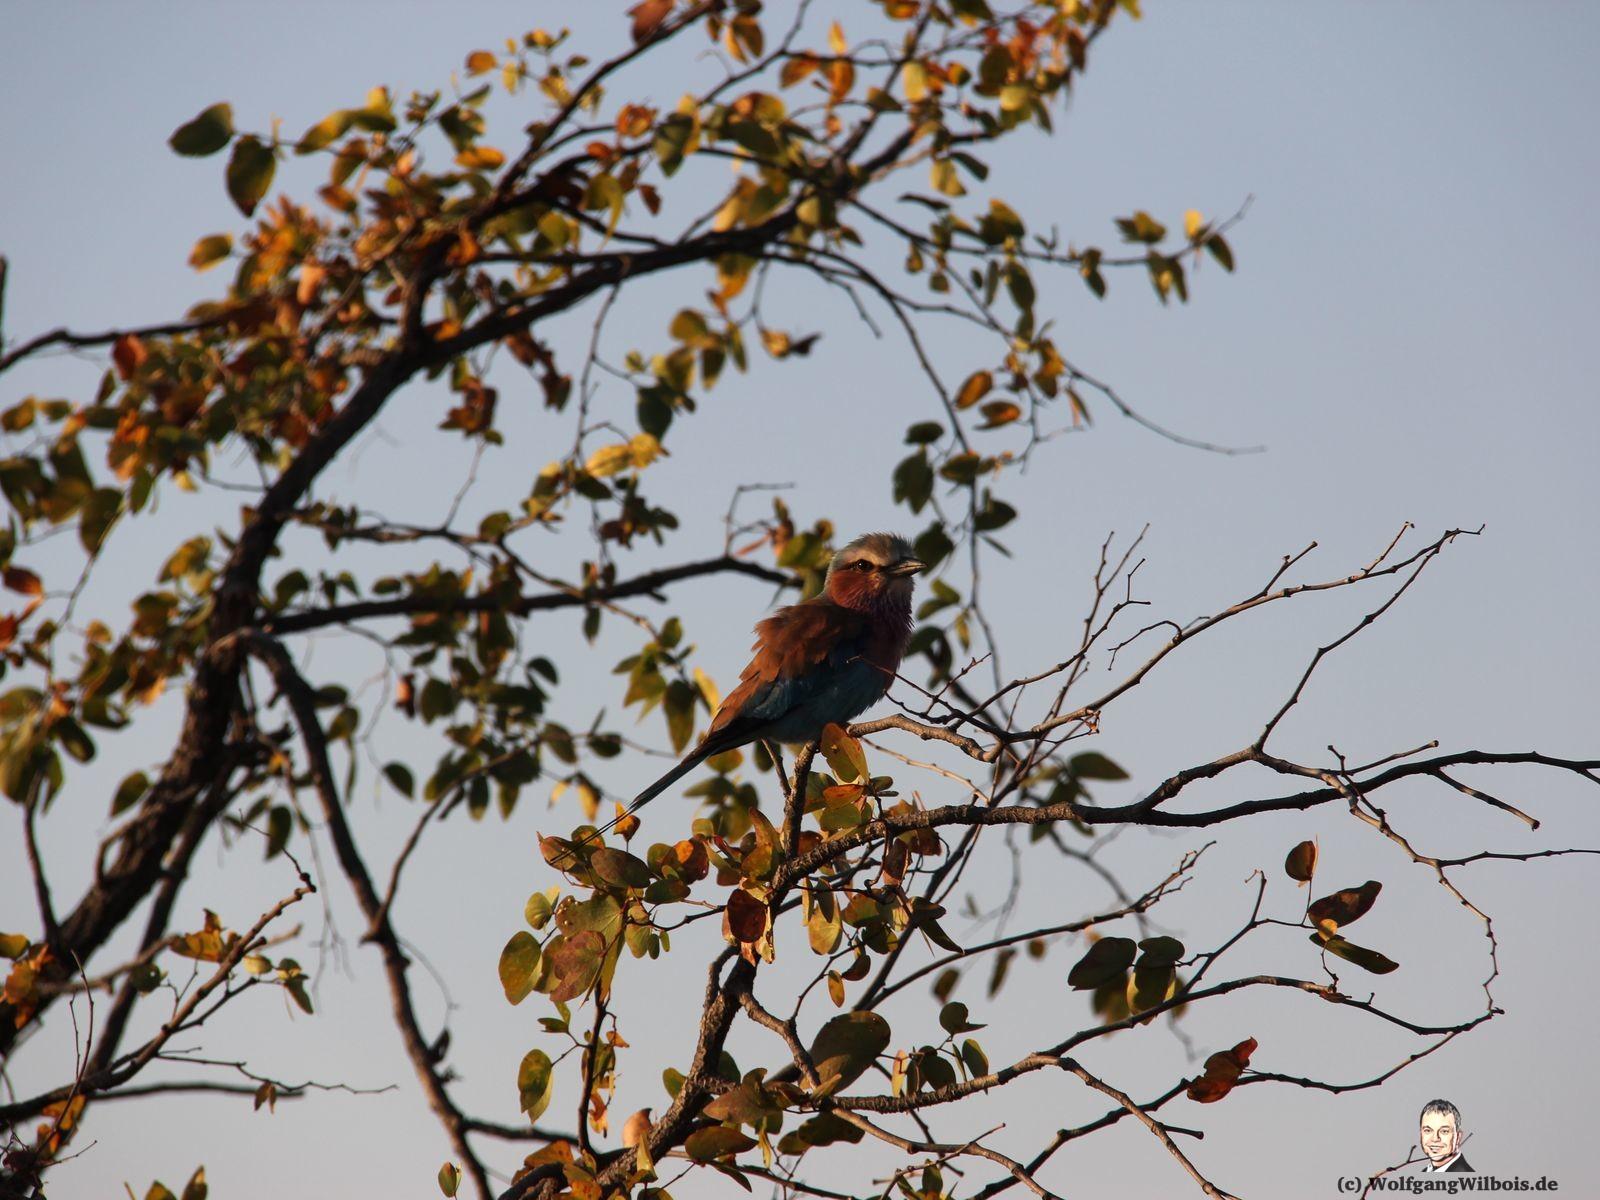 Suedafrika Krueger Nationalpark Vogel